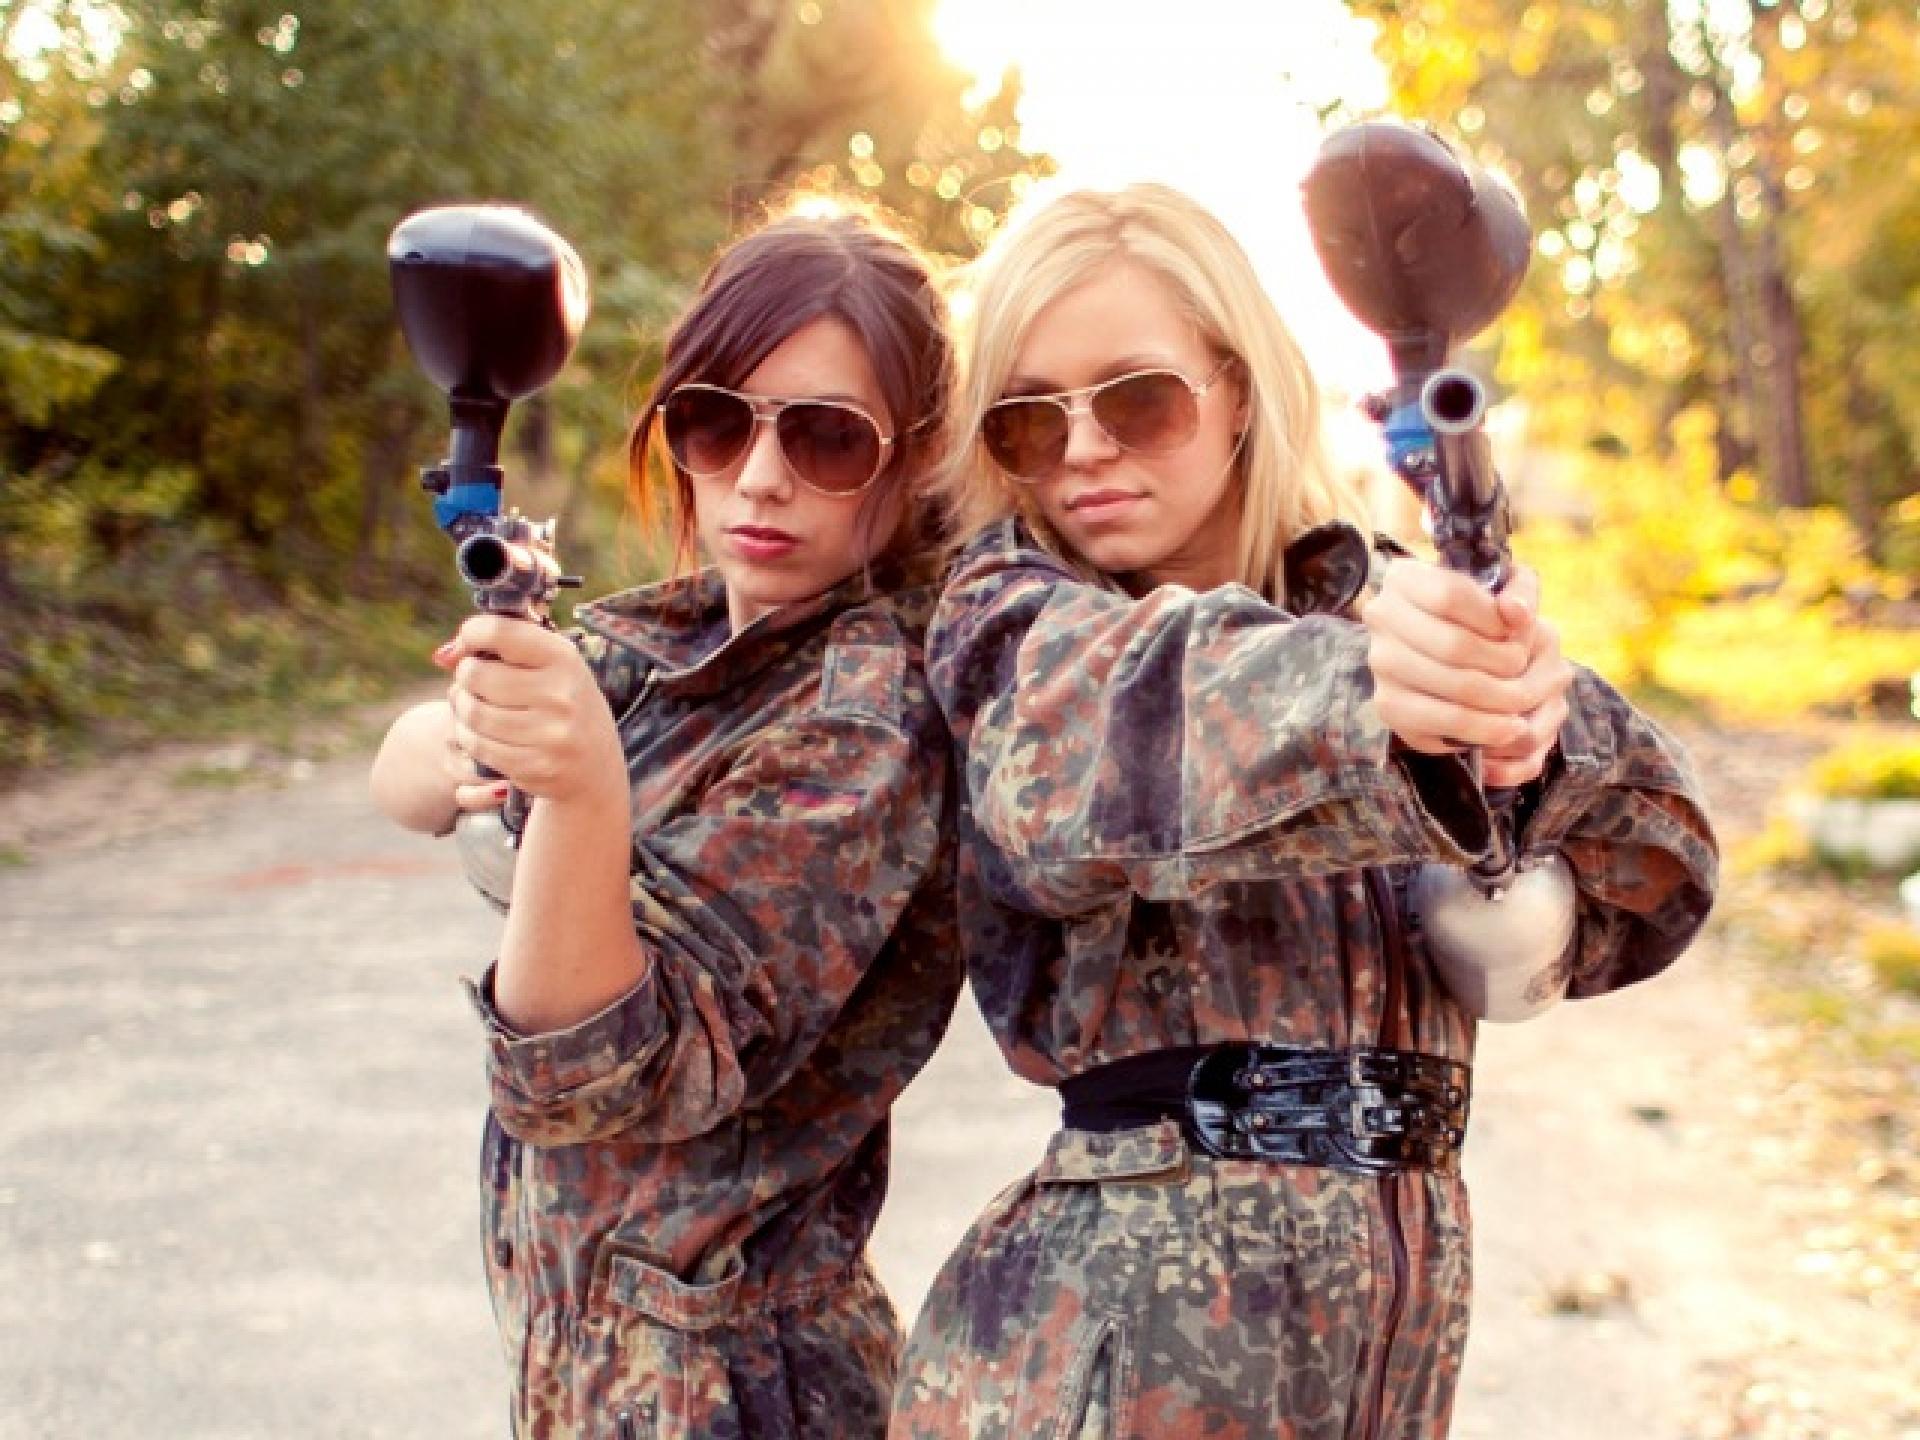 girls with paintball guns